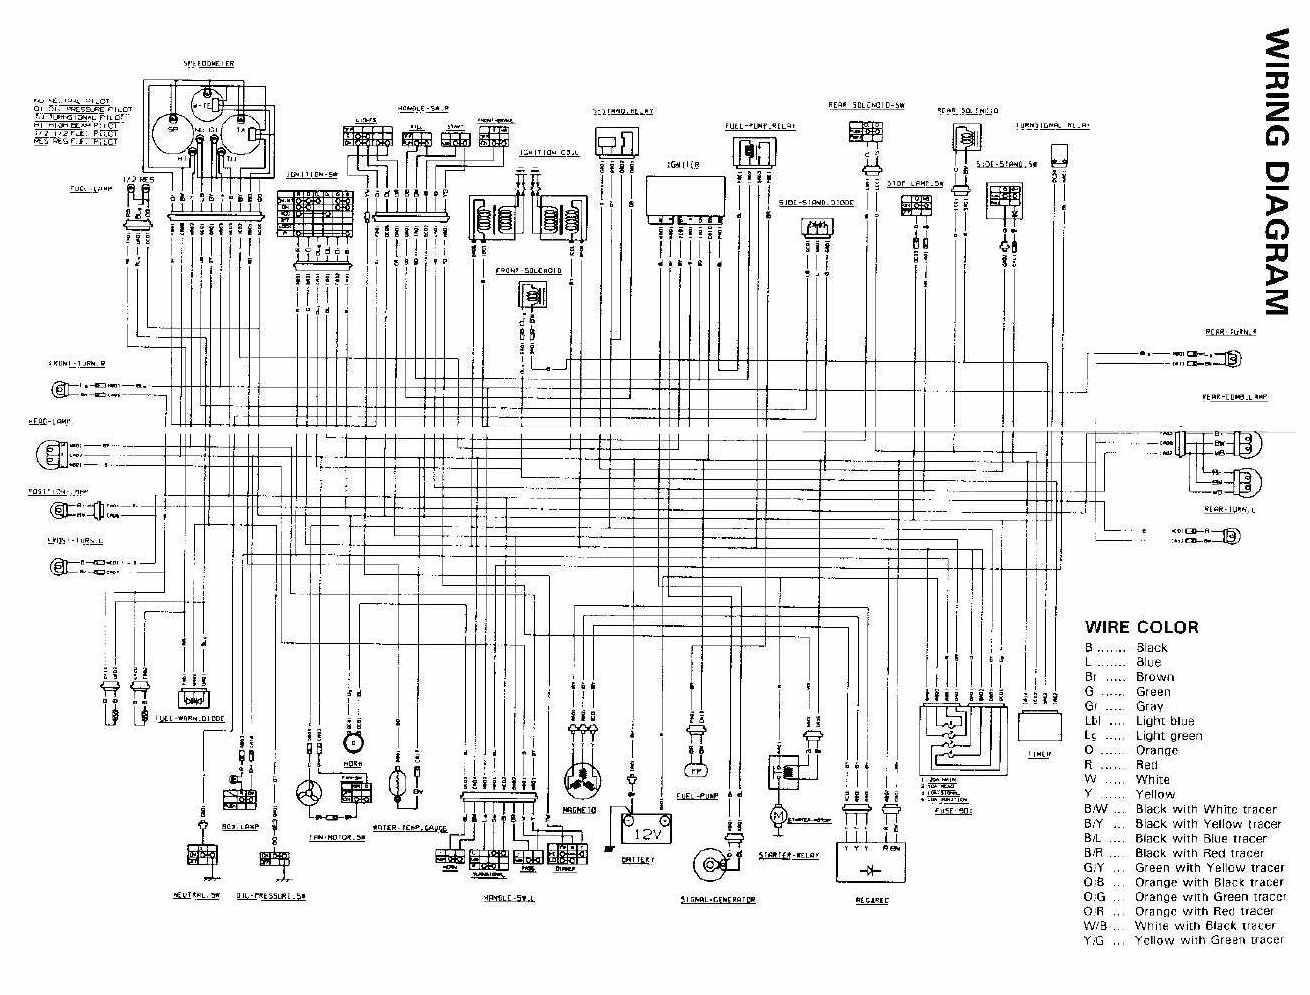 Nissan Champ Wiring Diagram